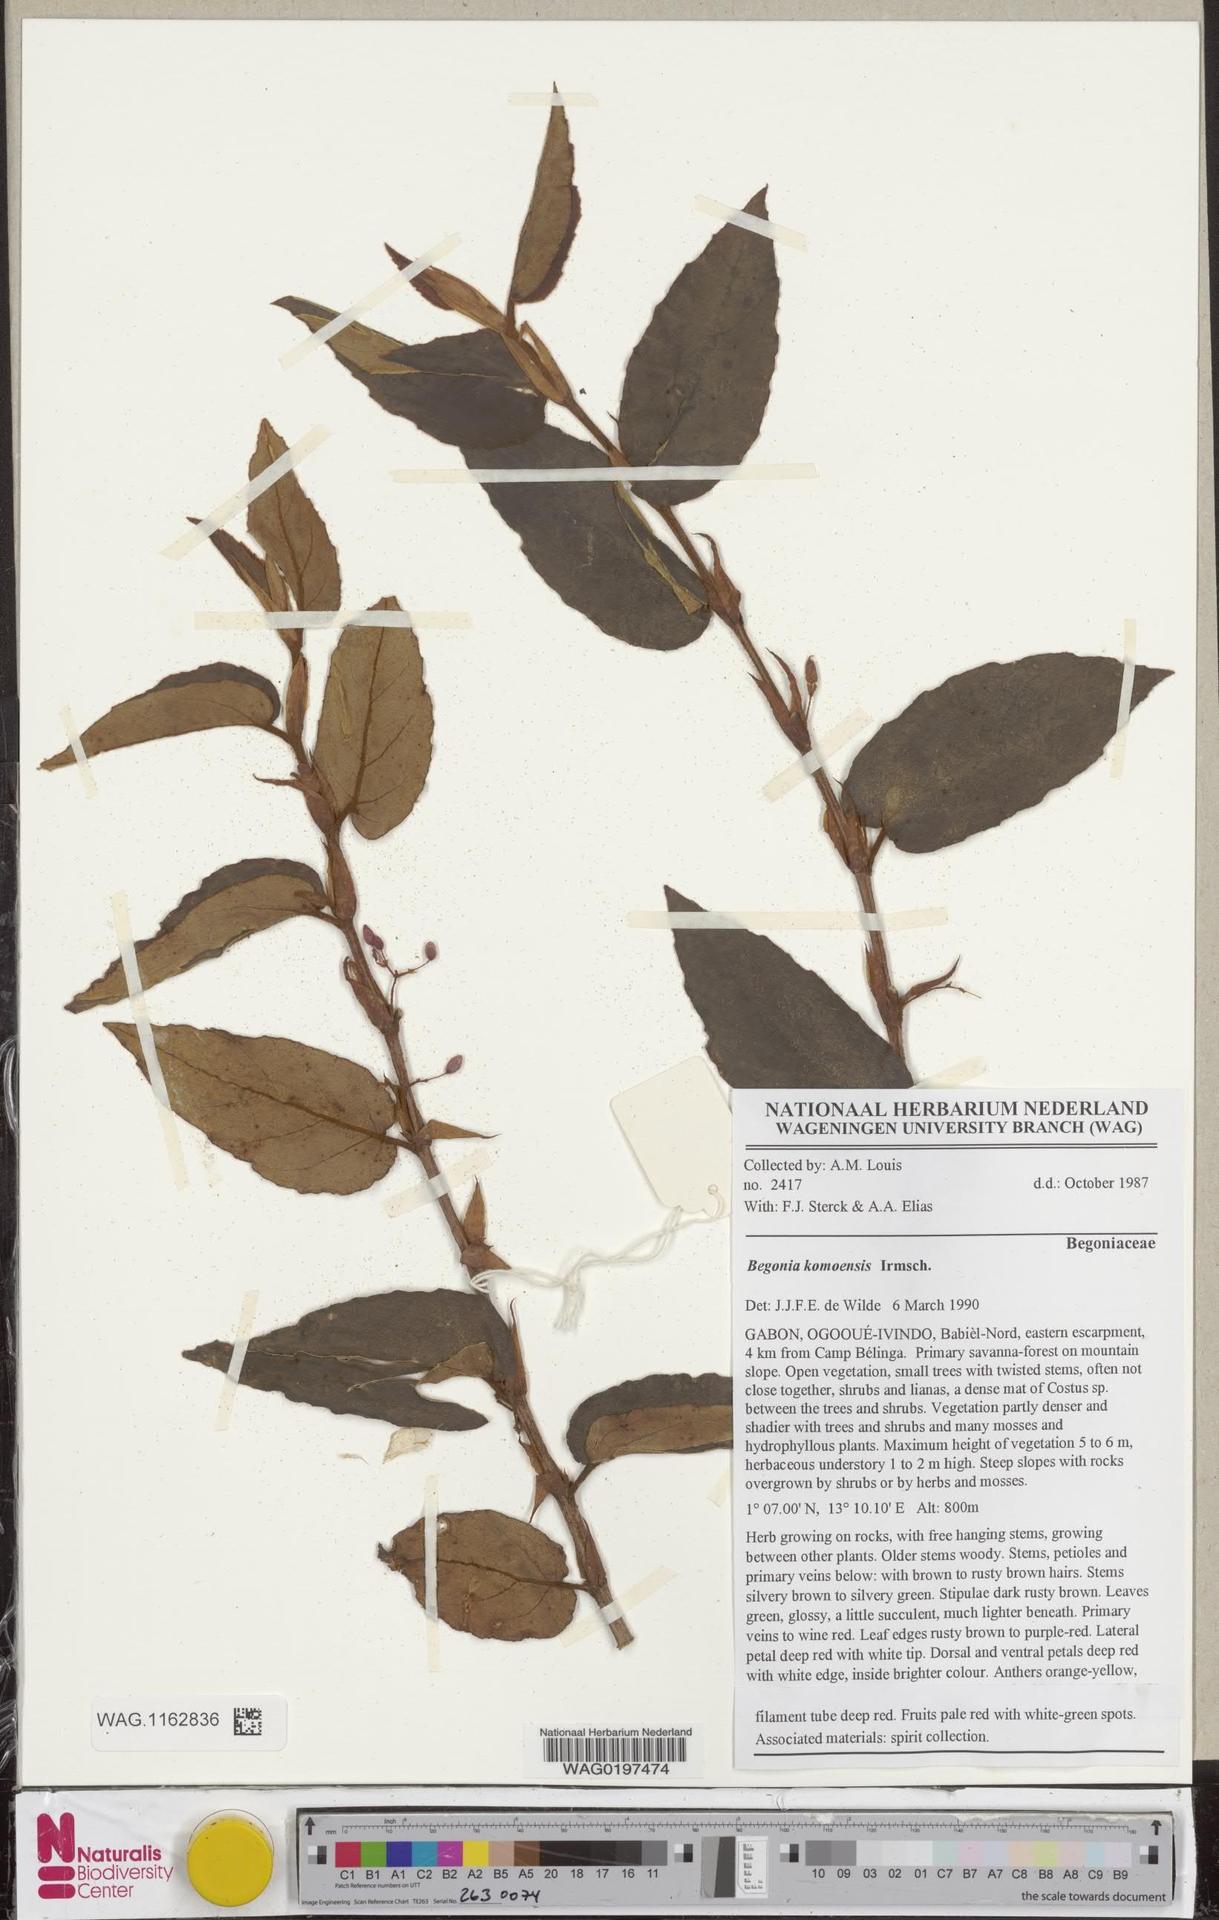 WAG.1162836   Begonia komoensis Irmsch.